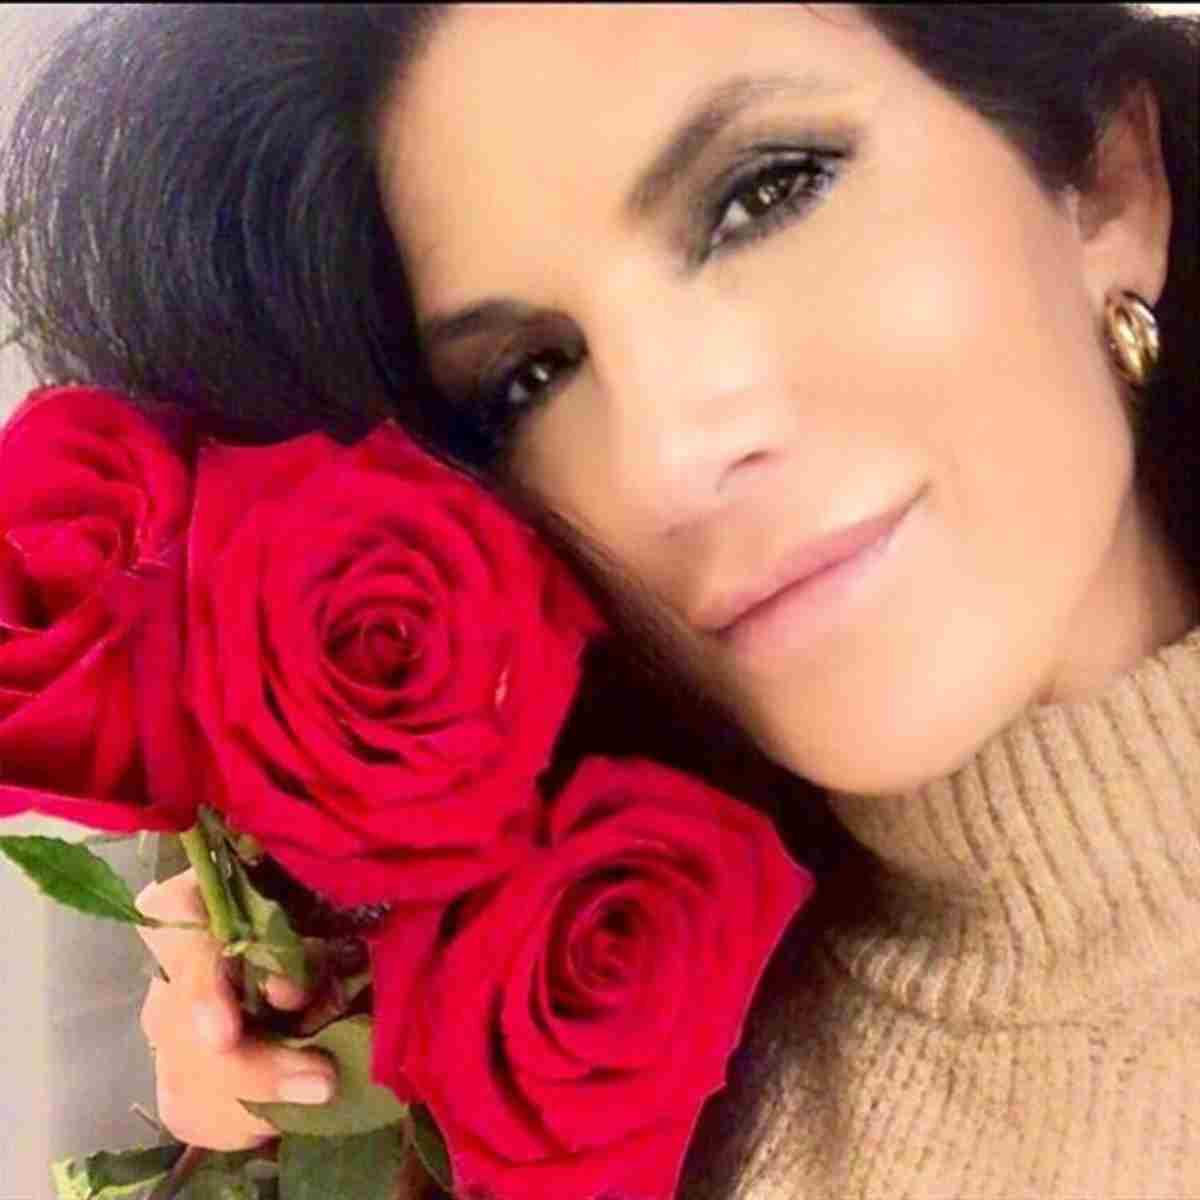 Pamela Prati: nozze, ultime notizie, Instagram, oggi, malore, figli